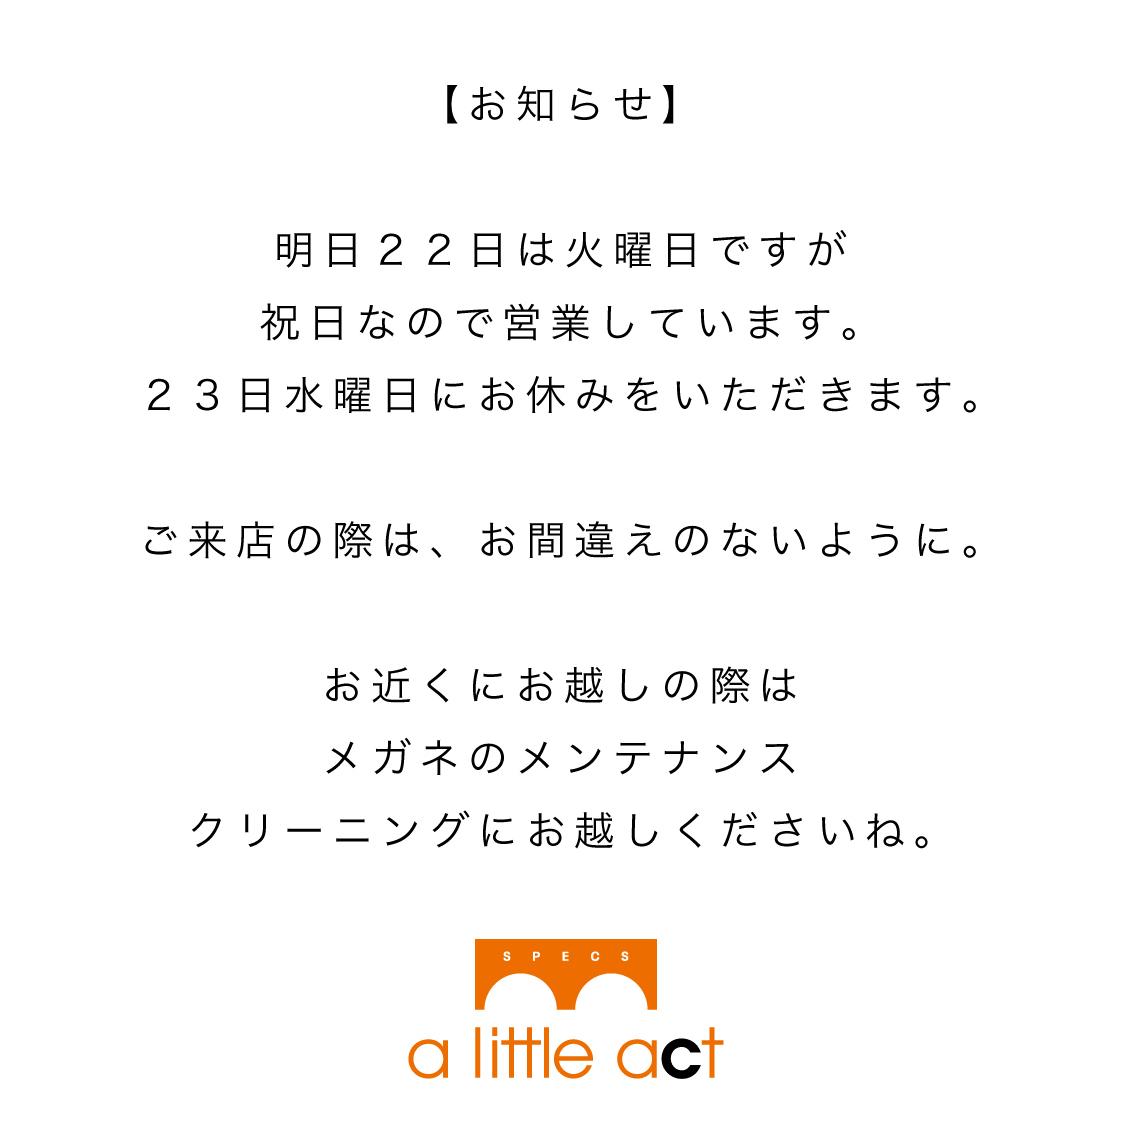 f:id:alittleact:20200921185849j:plain